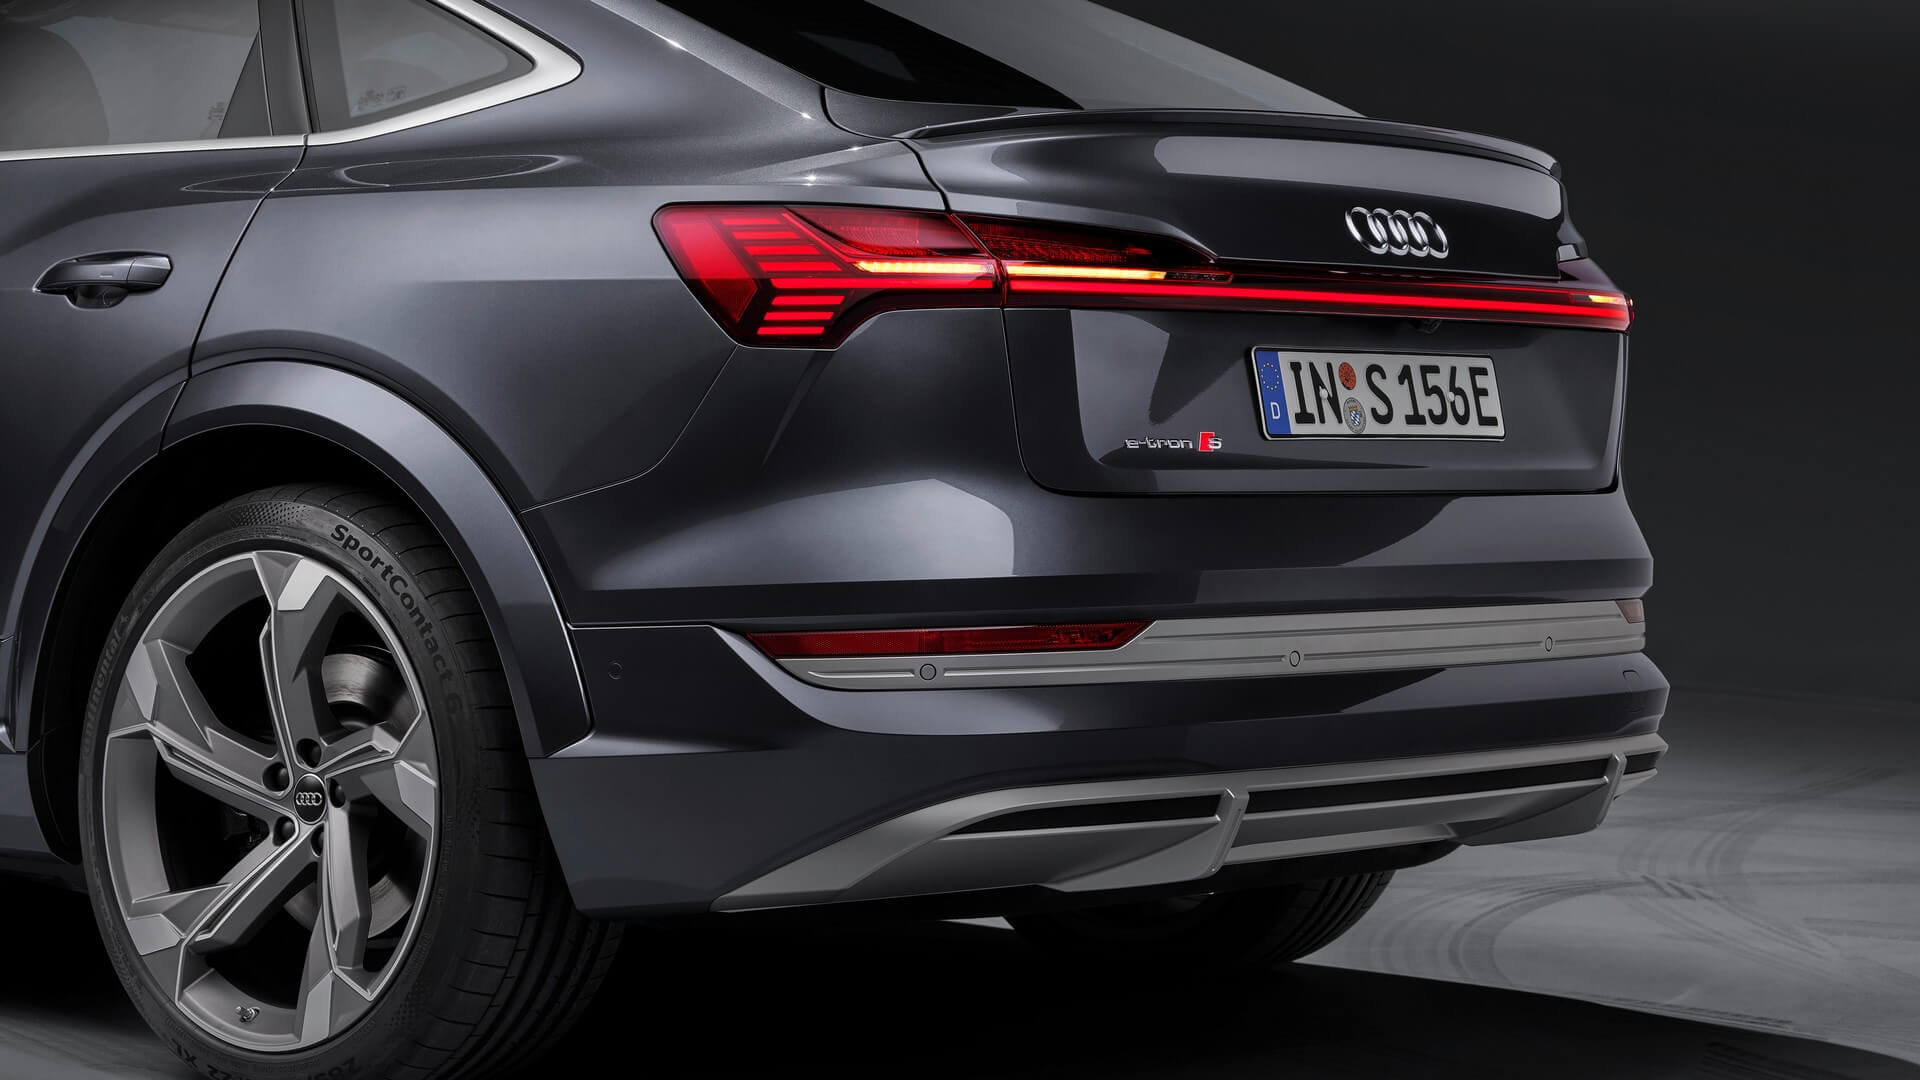 Audi-E-Tron-S-and-E-Tron-S-Sportback-2020-98